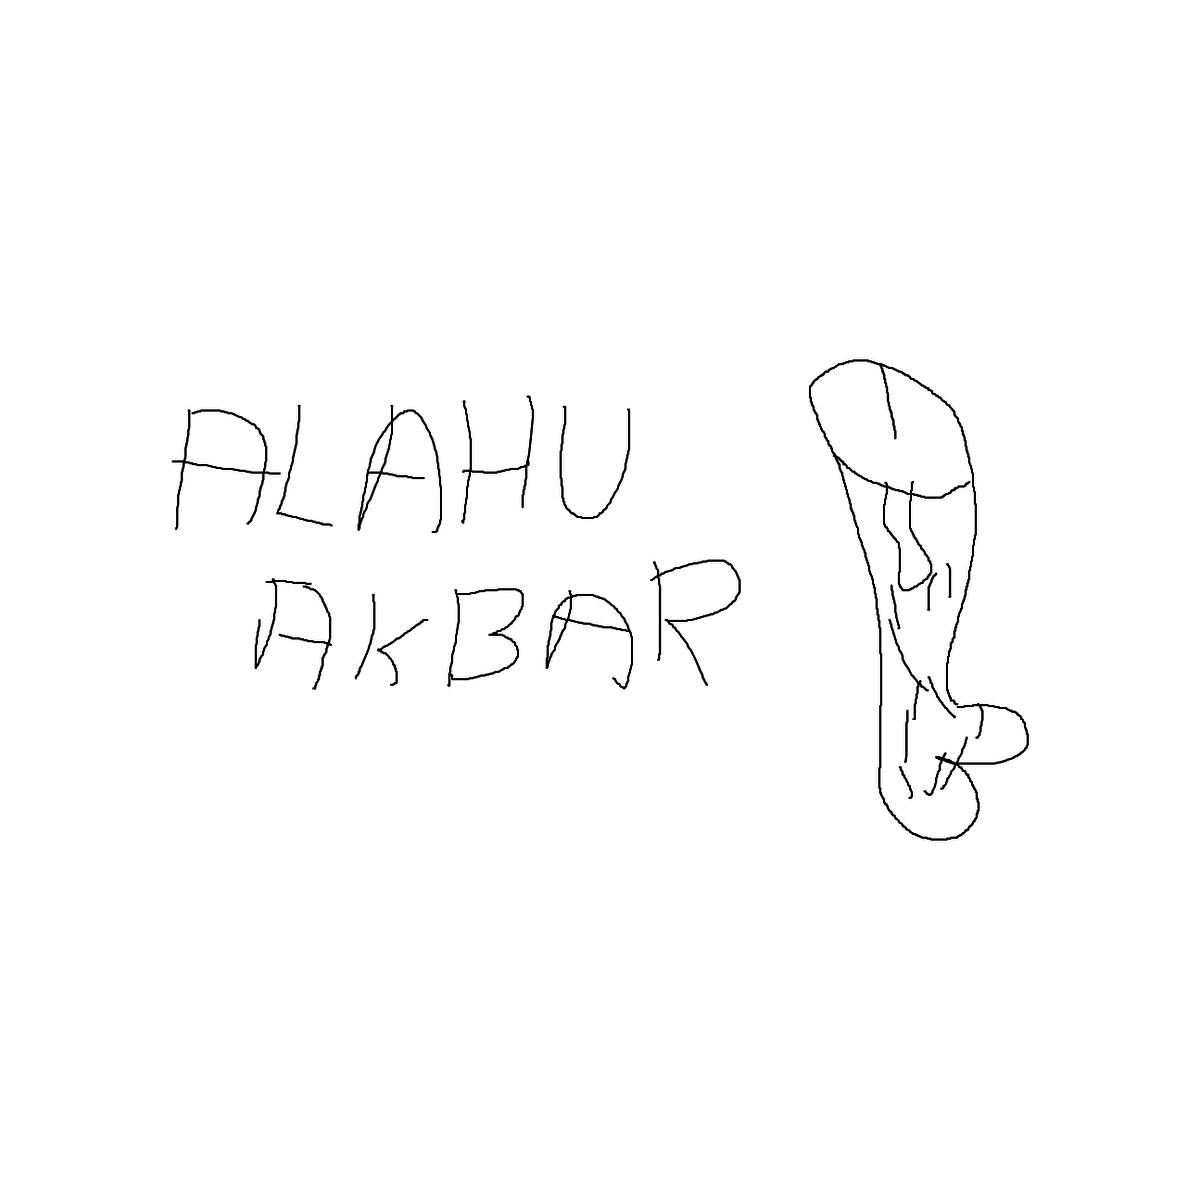 BAAAM drawing#14481 lat:44.8420562744140600lng: 20.6103172302246100